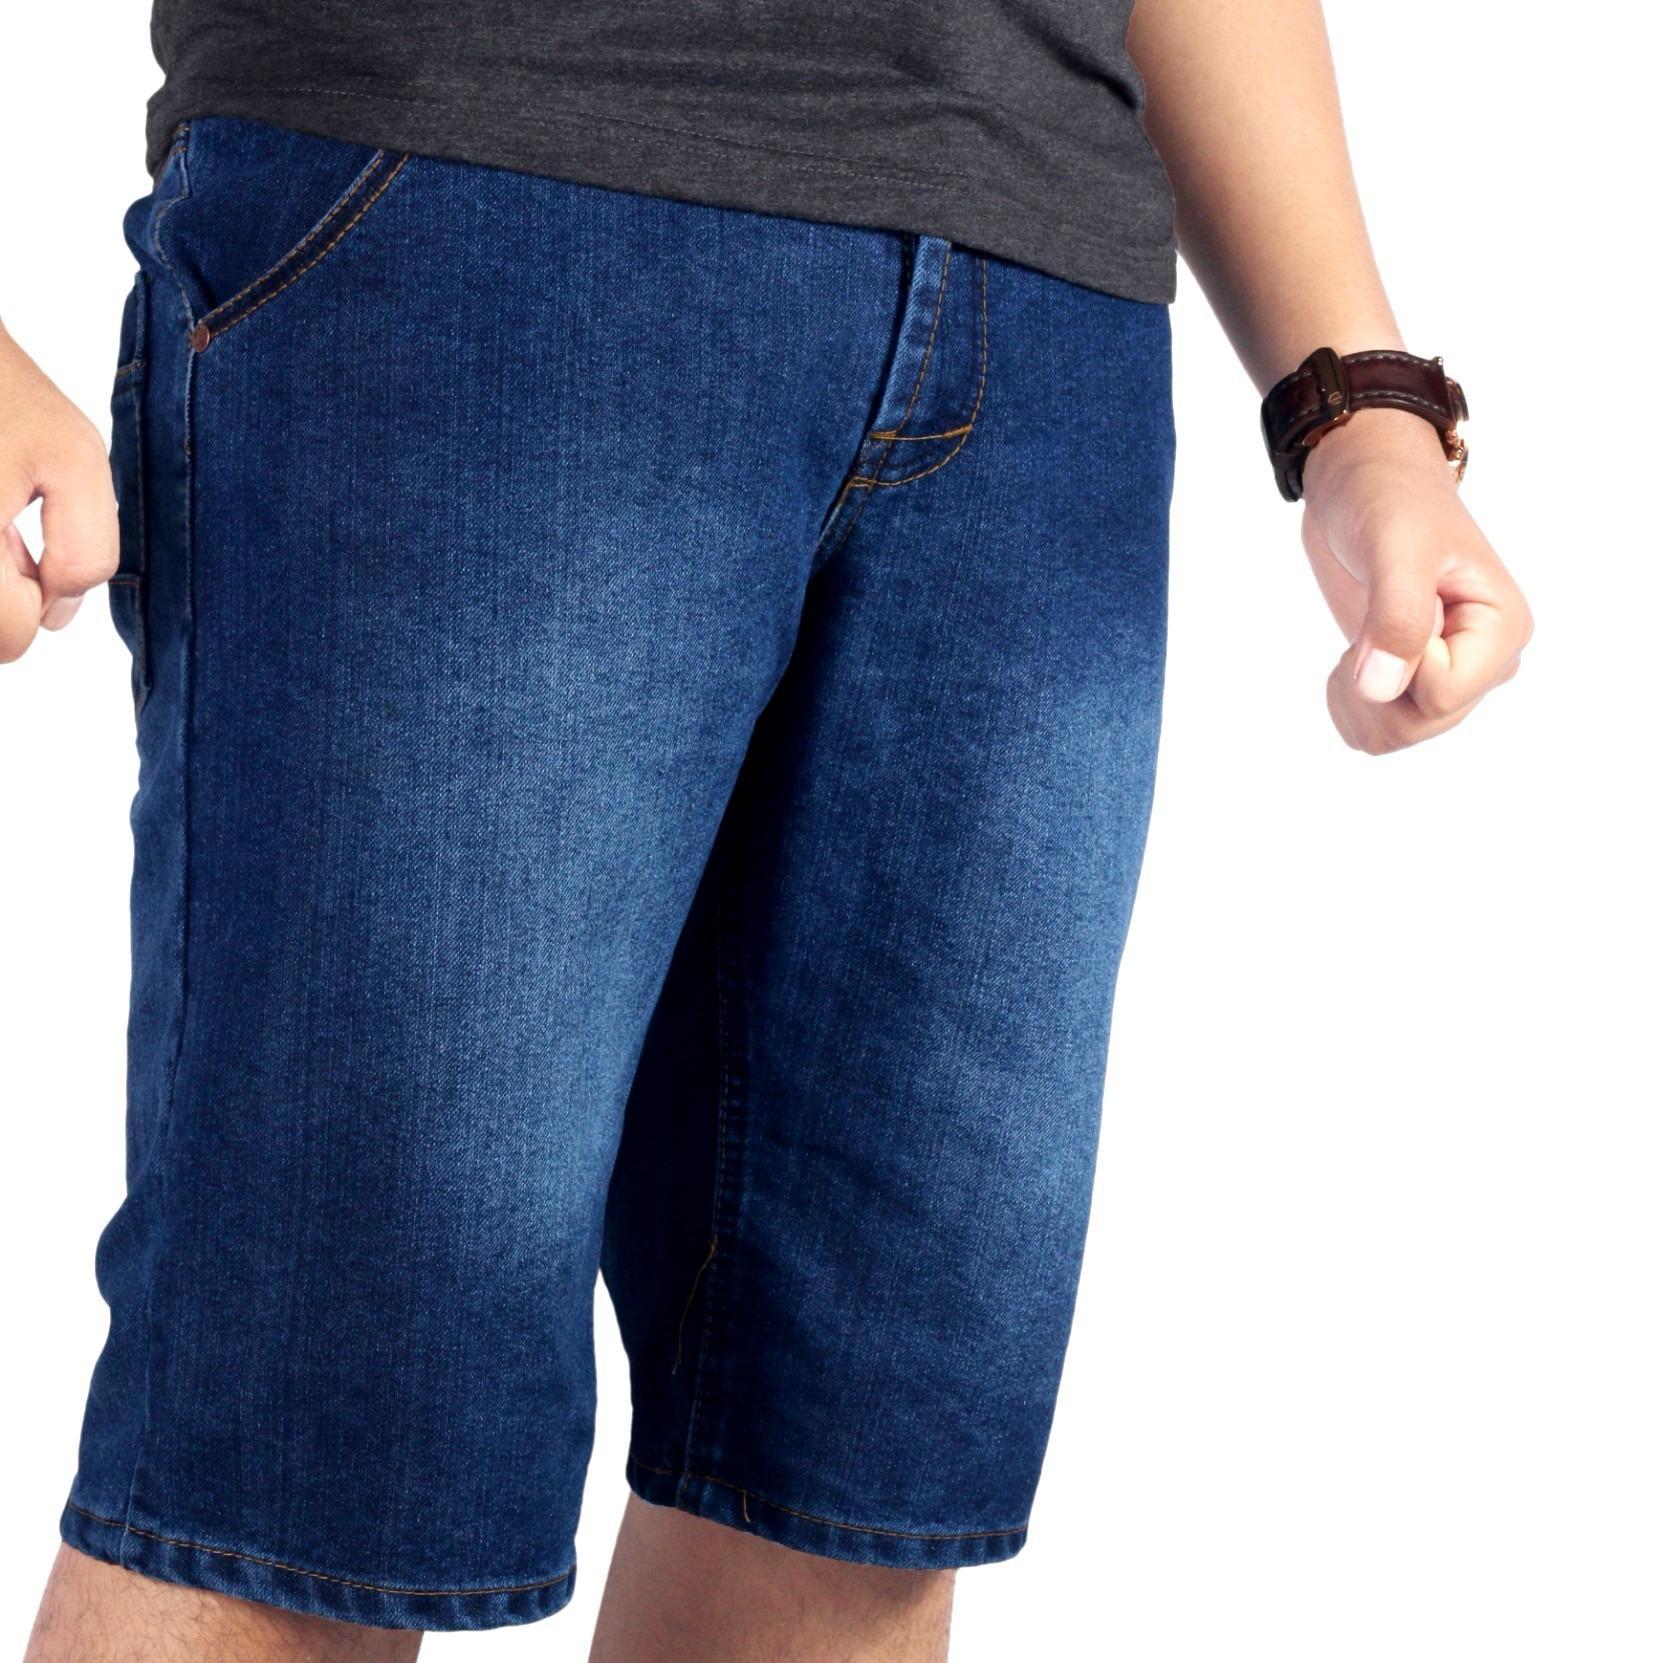 Dgm_Fashion1 Jeans Pendek Jumbo Biru/Celana Jeans Pendek Denim Jumbo /Celana lepis/Celana Jeans Skinny Pria/Celana Panjang/ Celana Pria/Celana Casual/celana denim/celana jeans gede/jeans besar /CELANA JEANS big size/Celana Big Size/Jeans Gendut AX 5523